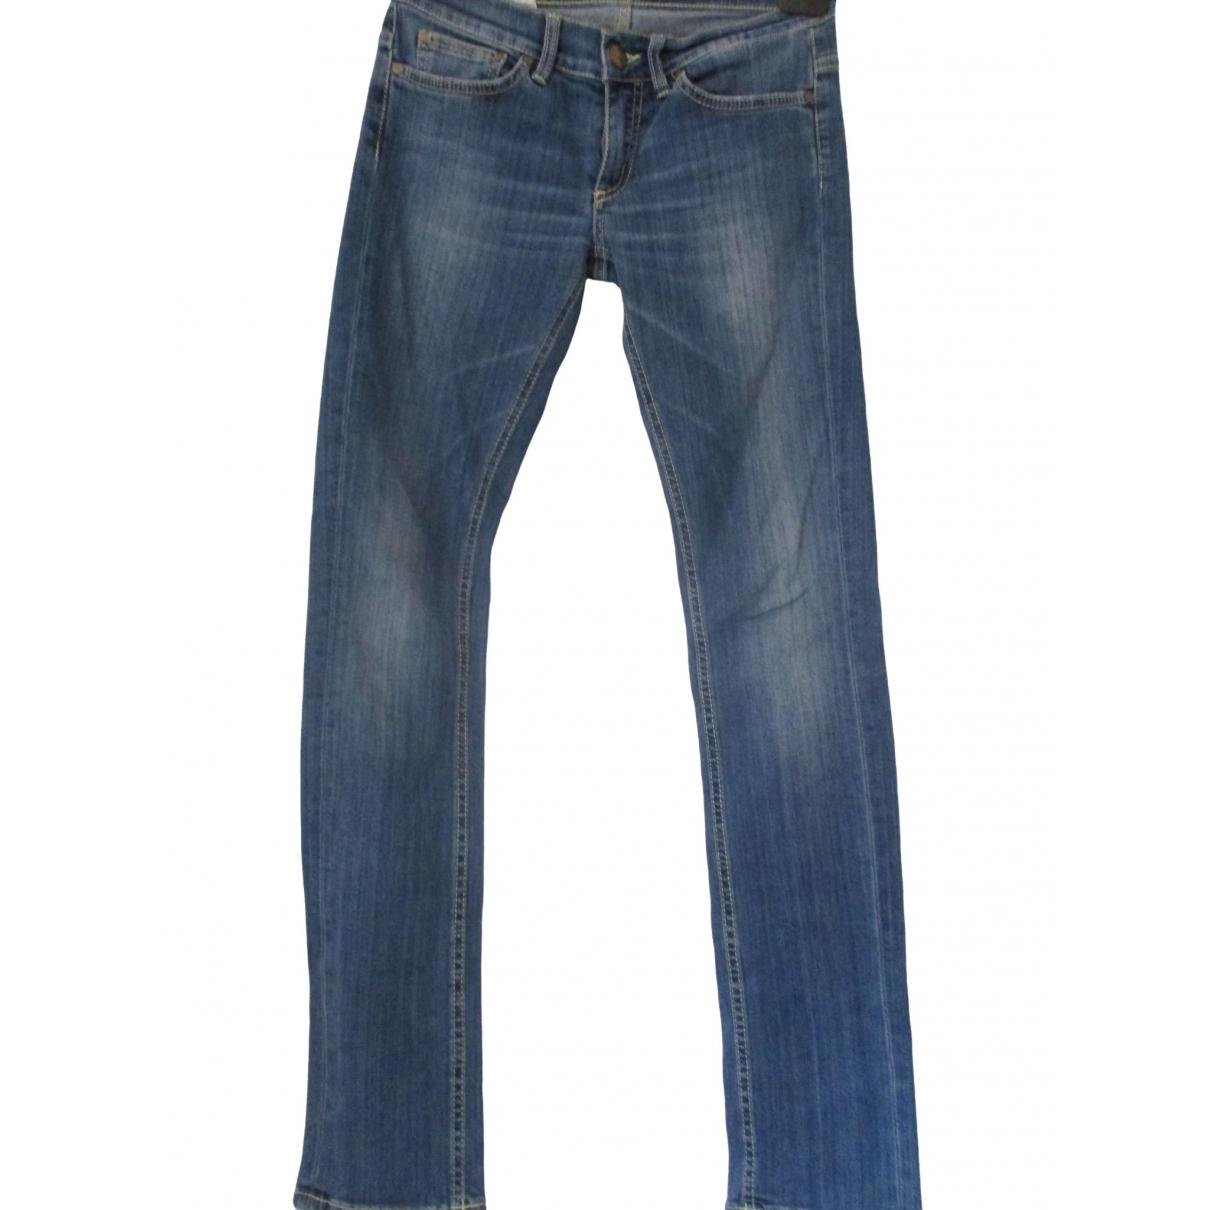 Dondup \N Blue Denim - Jeans Trousers for Women 40 IT